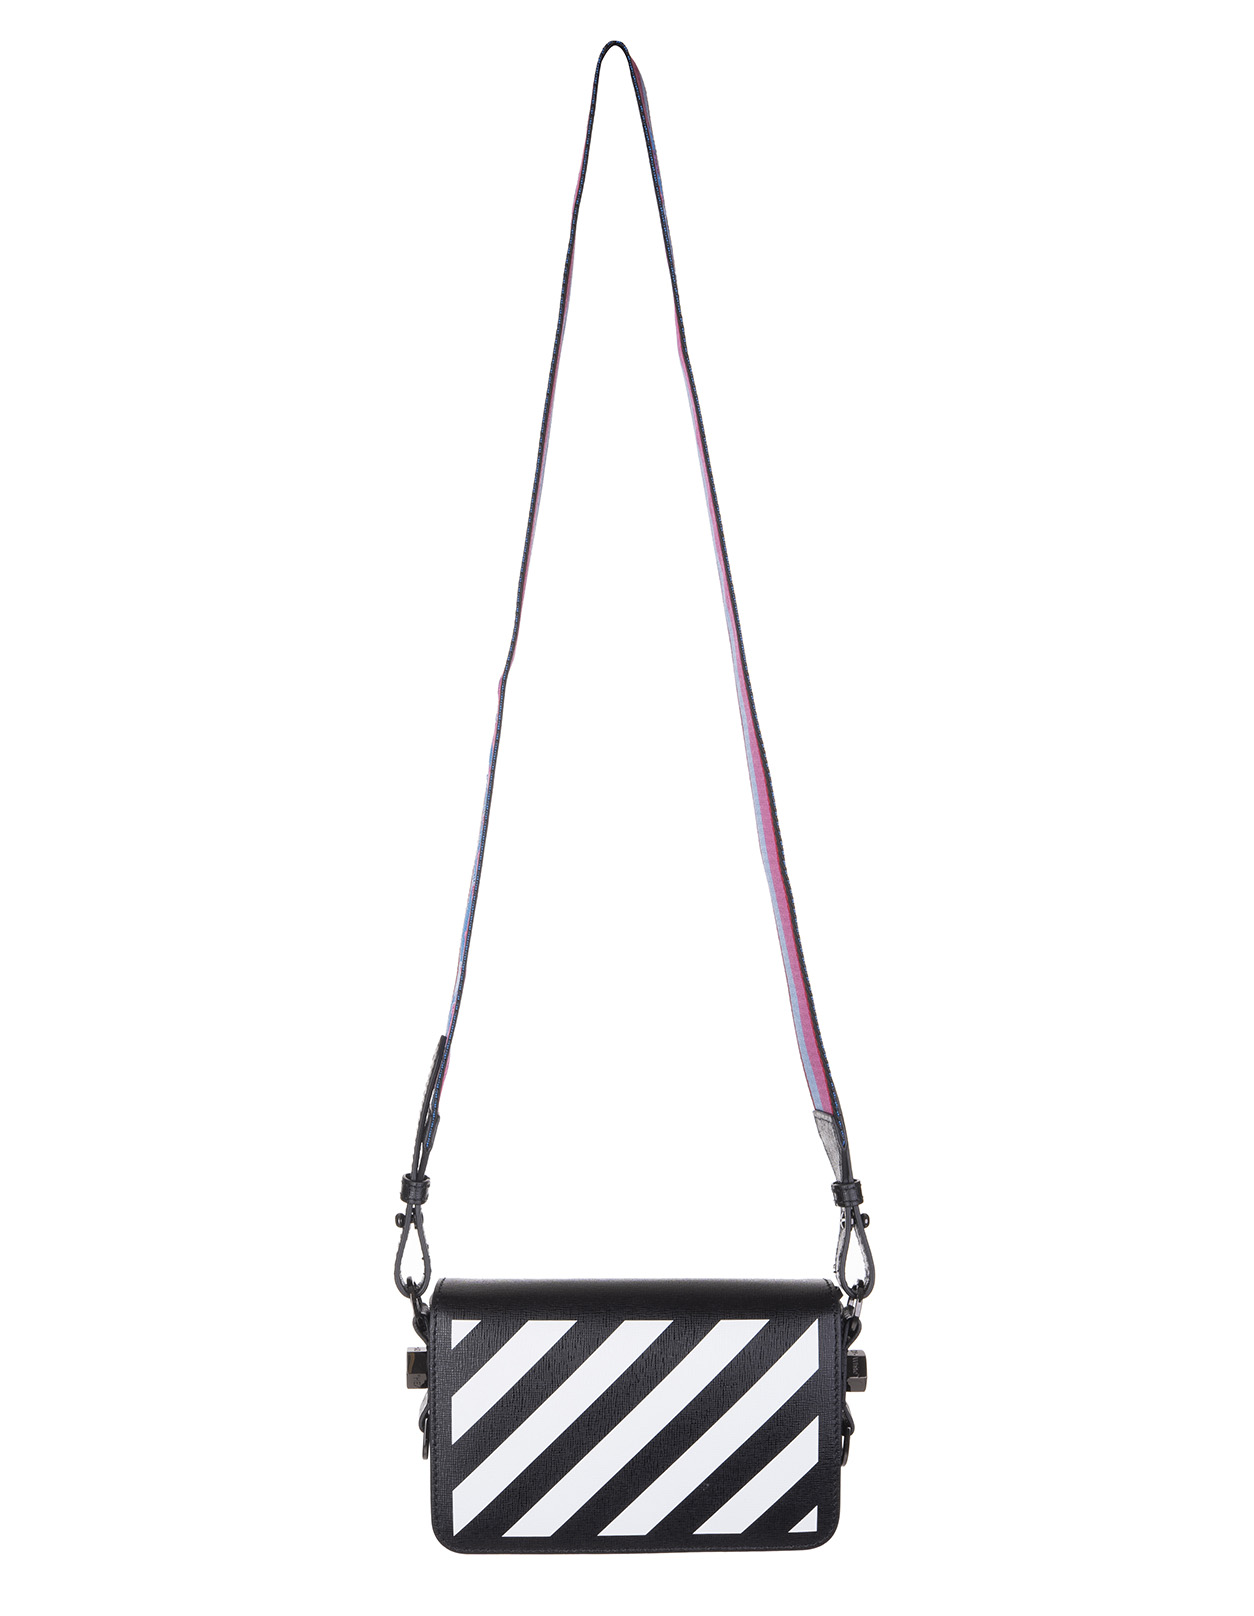 OFF-WHITE Black Diag Mini Shoulder Bag